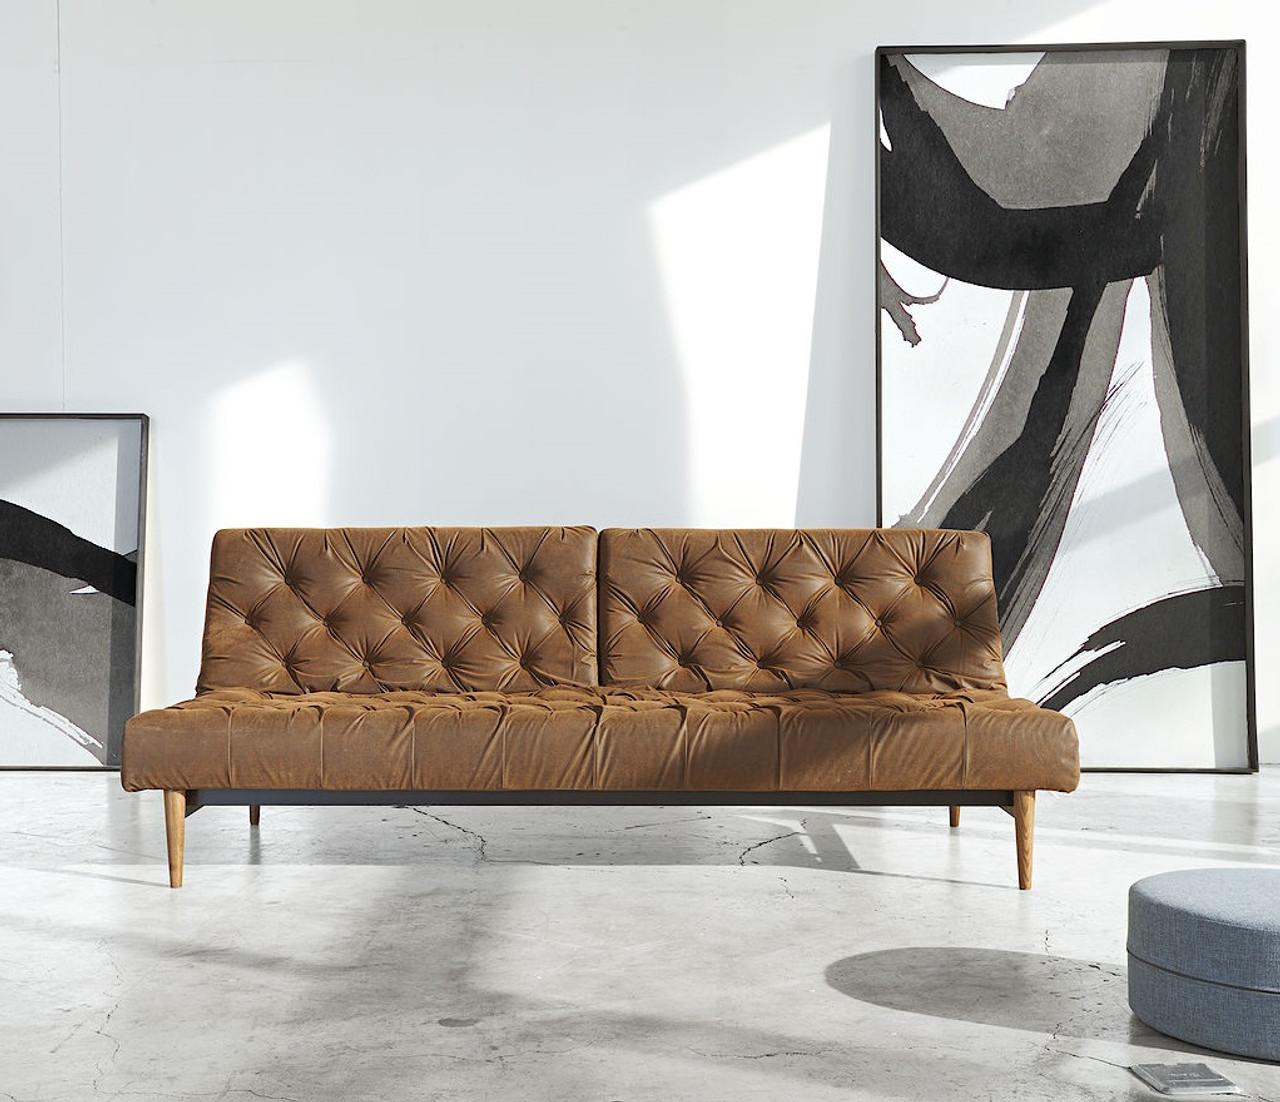 Beau Innovation USA Oldschool Vintage Leather Chesterfield Sleeper Sofa Bed